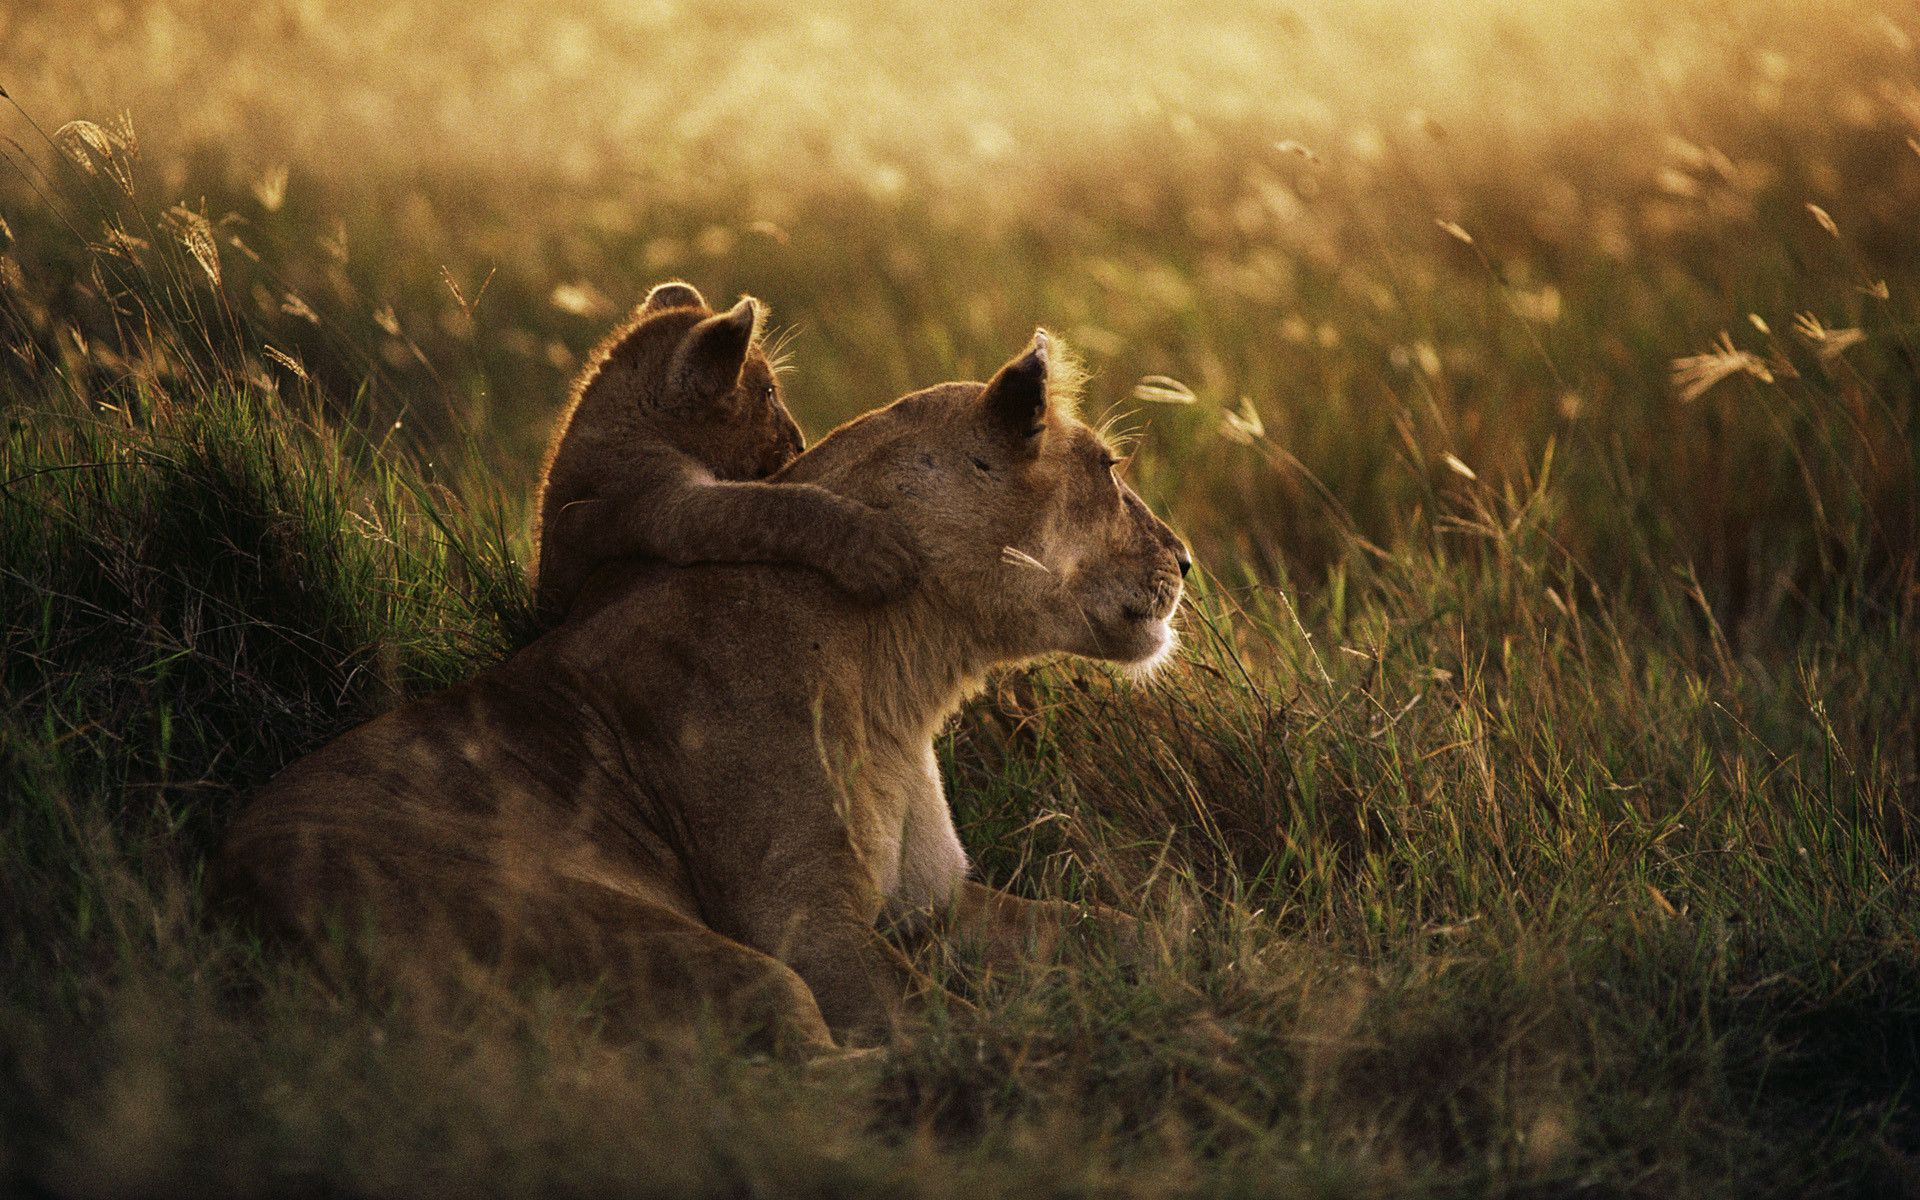 African Animal Desktop Wallpapers - Top Free African Animal Desktop  Backgrounds - WallpaperAccess